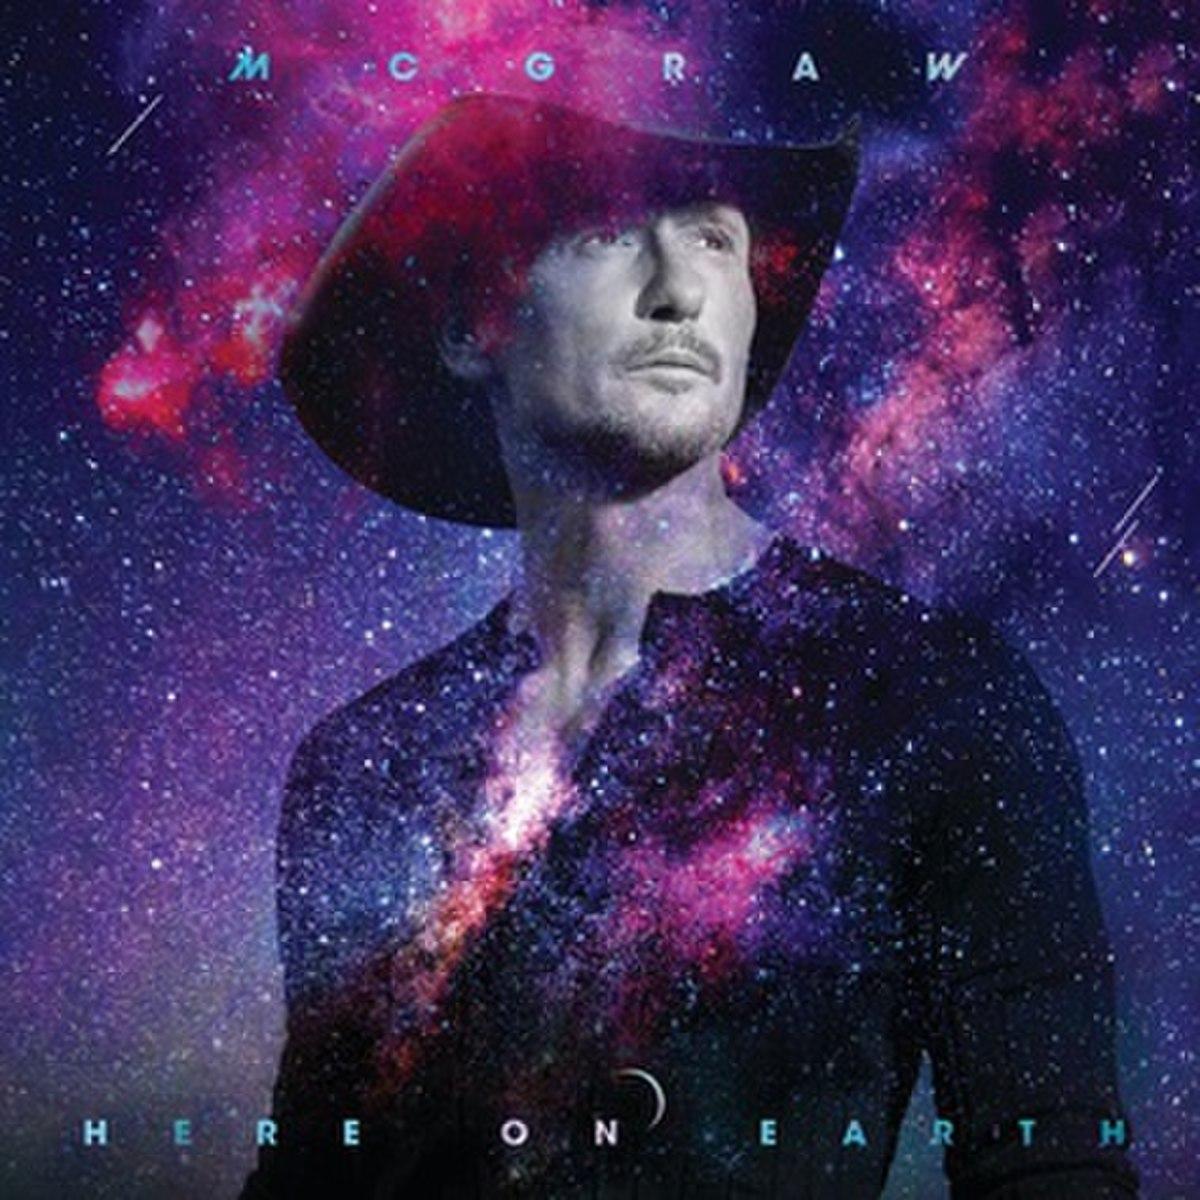 Here on Earth (Tim McGraw album) - Wikipedia